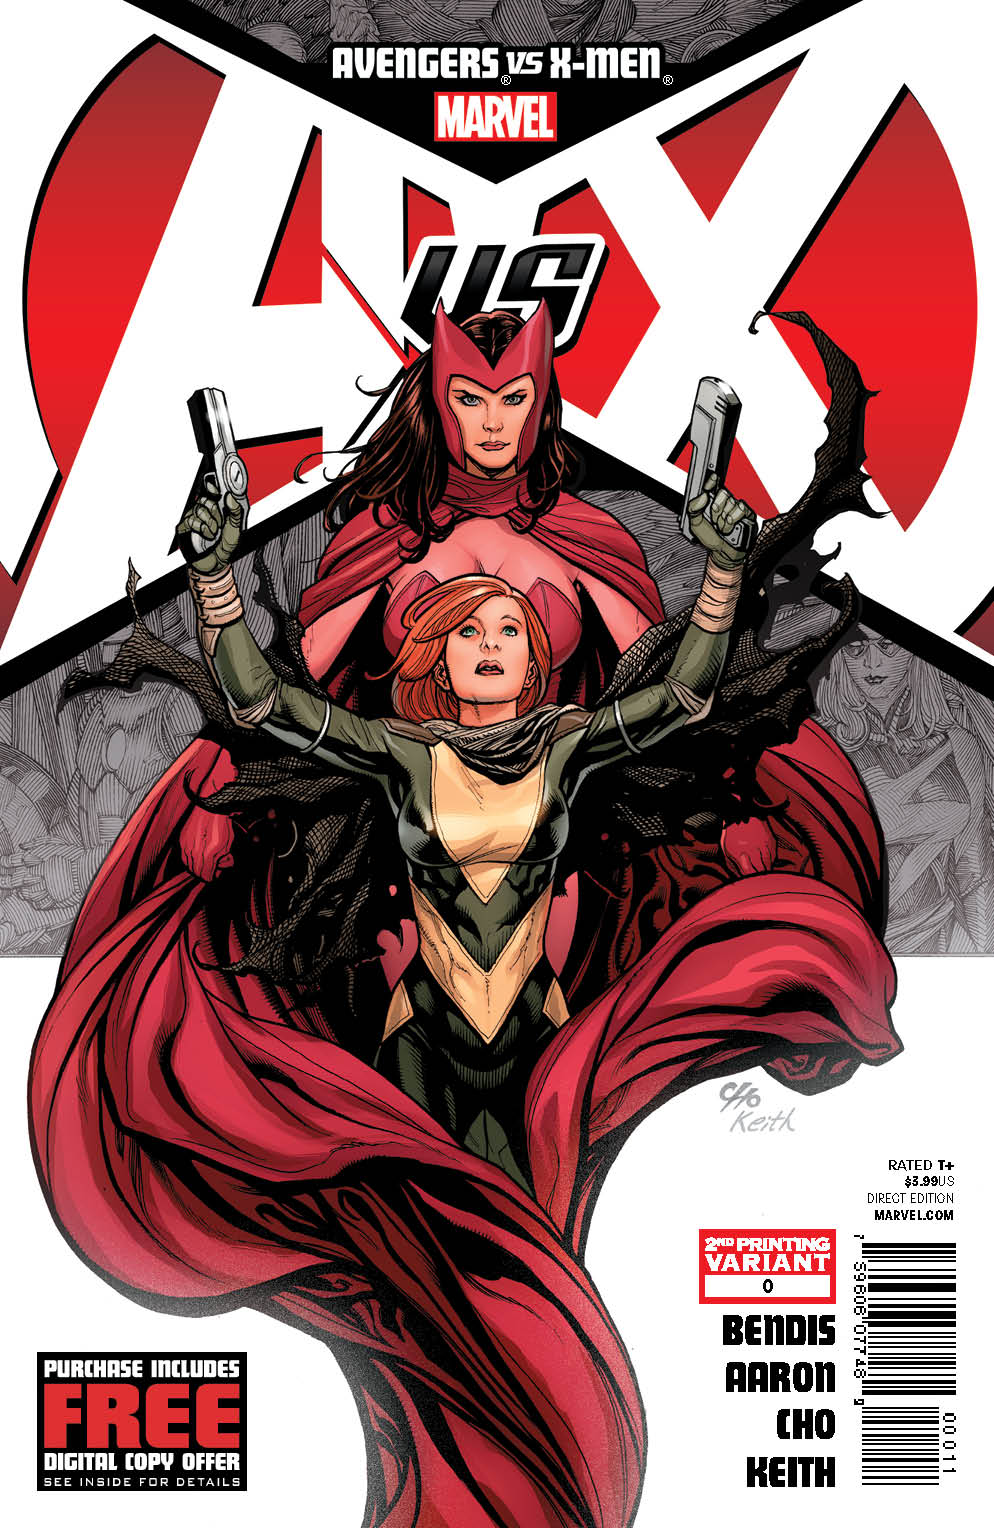 AvengersVSXMen_0_SecondPrintingCover AVENGERS VS. X-MEN second printings rushed to stores